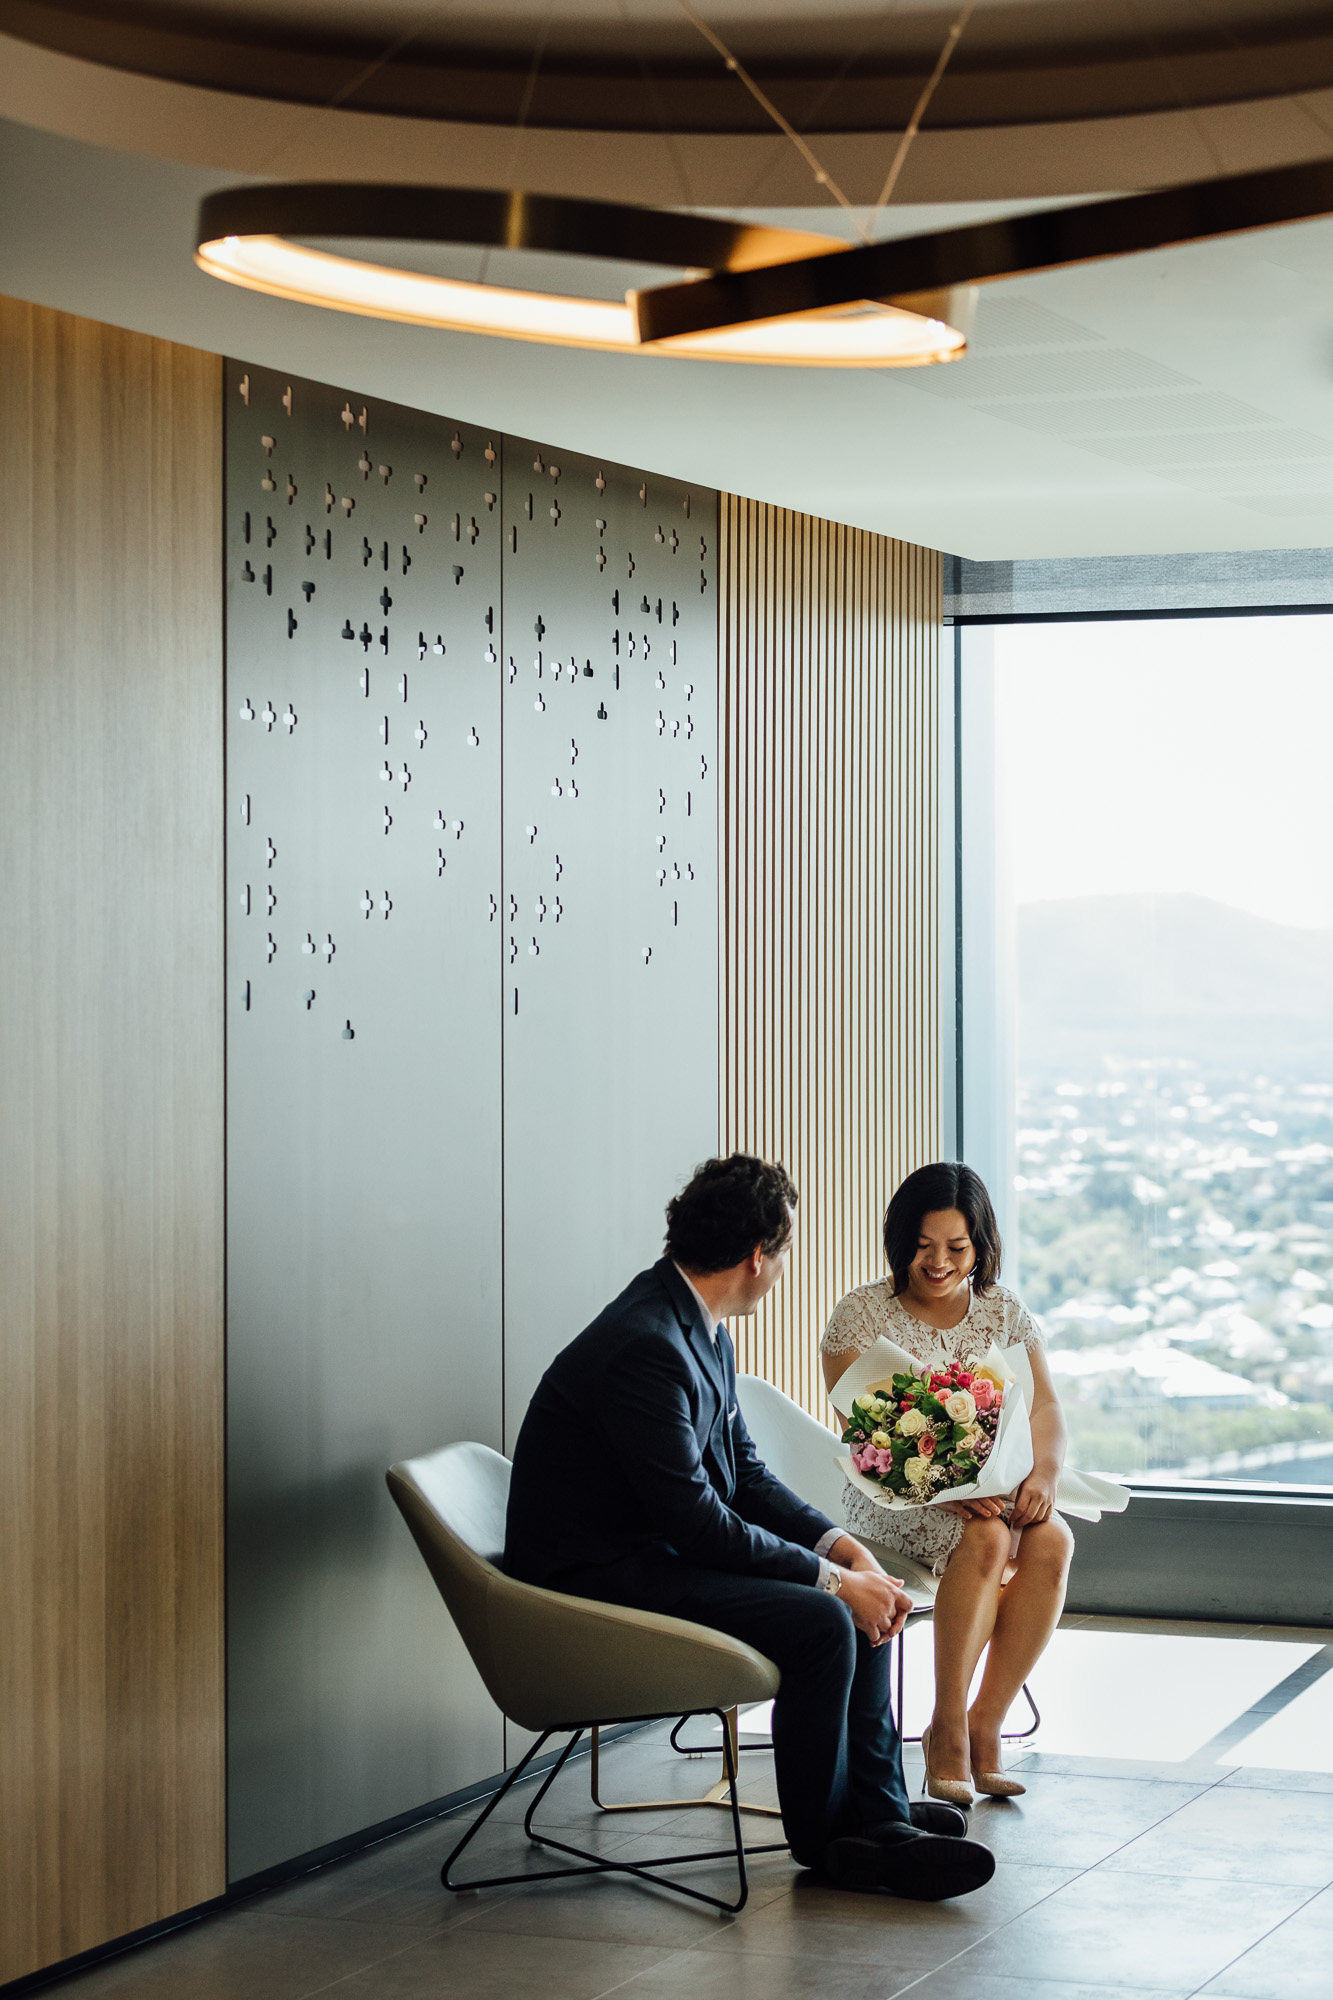 Brisbane Marriage Registry Foyer. Photo by Chris Jack